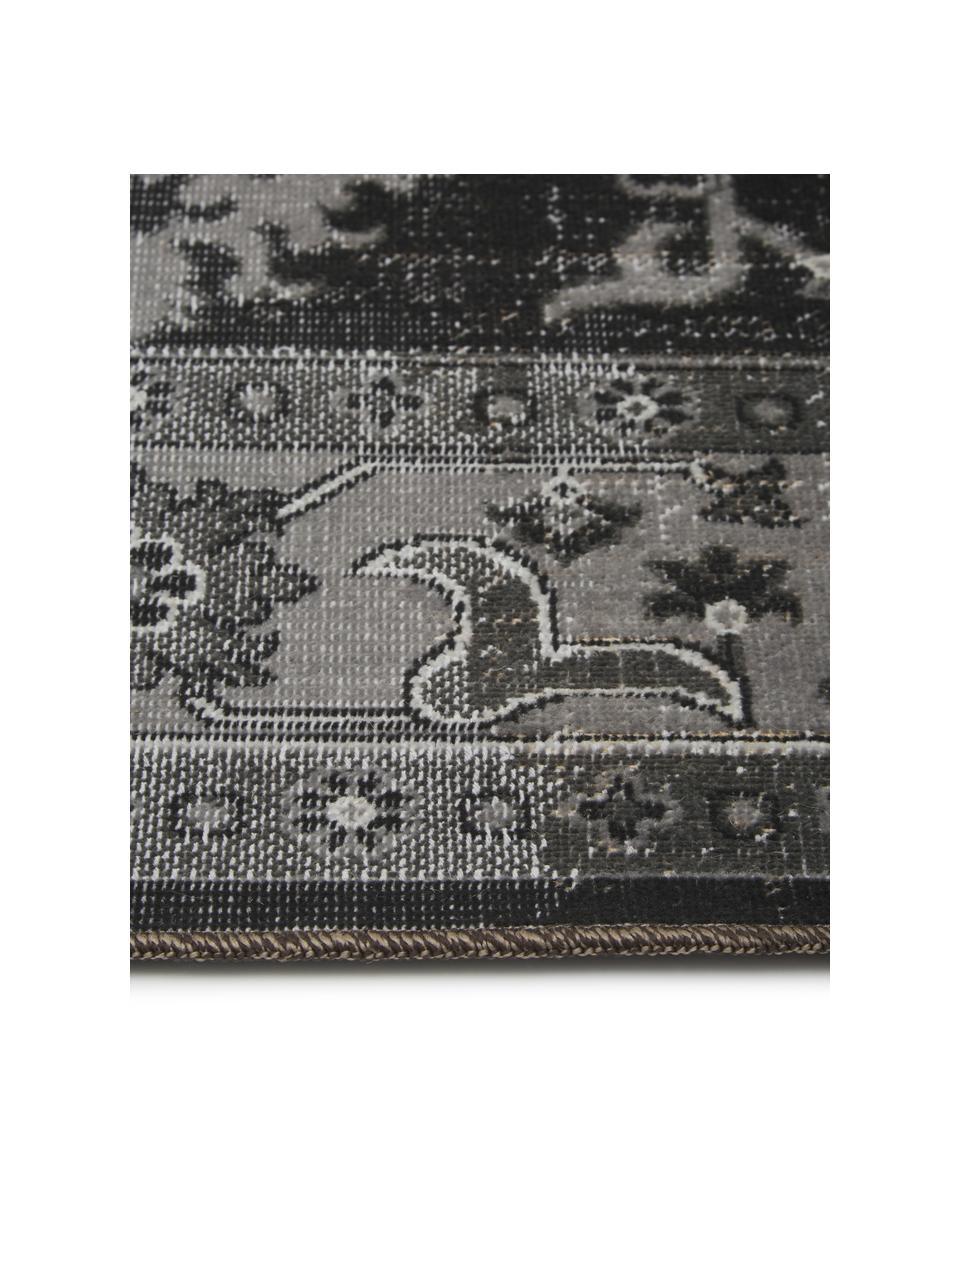 Tappeto vintage da interno-esterno Tilas Antalya, 100% polipropilene, Tonalità grigie, nero, Larg. 160 x Lung. 230 cm (taglia M)